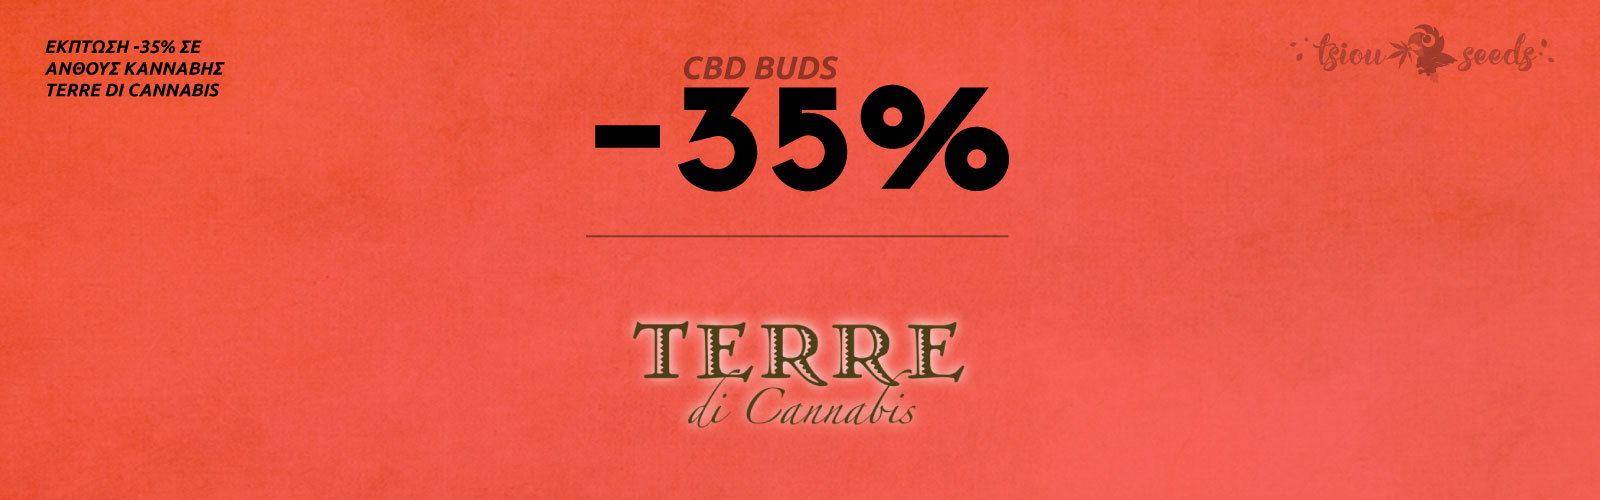 Terre-Di-Cannabis-Offer-35